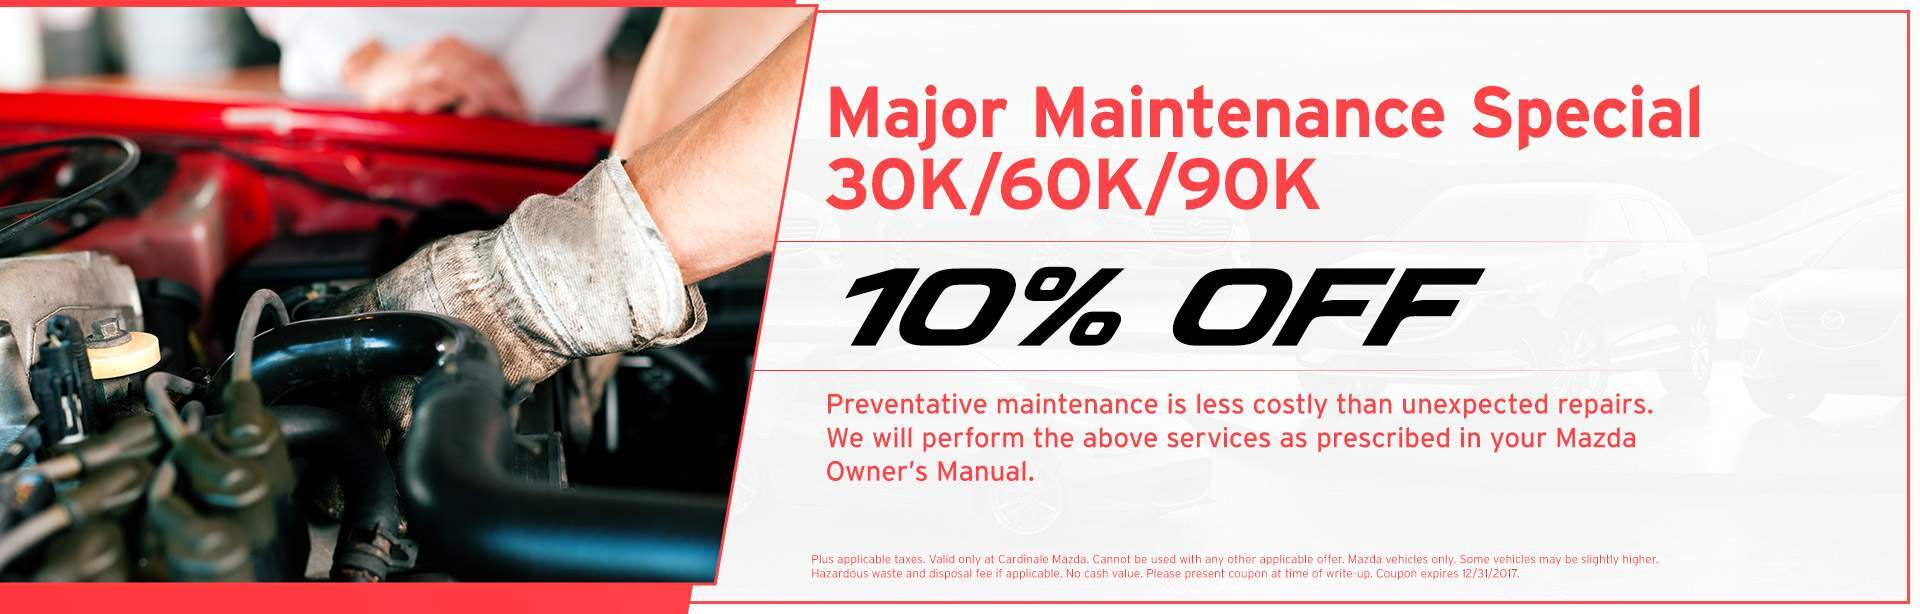 Mazda service coupons canada